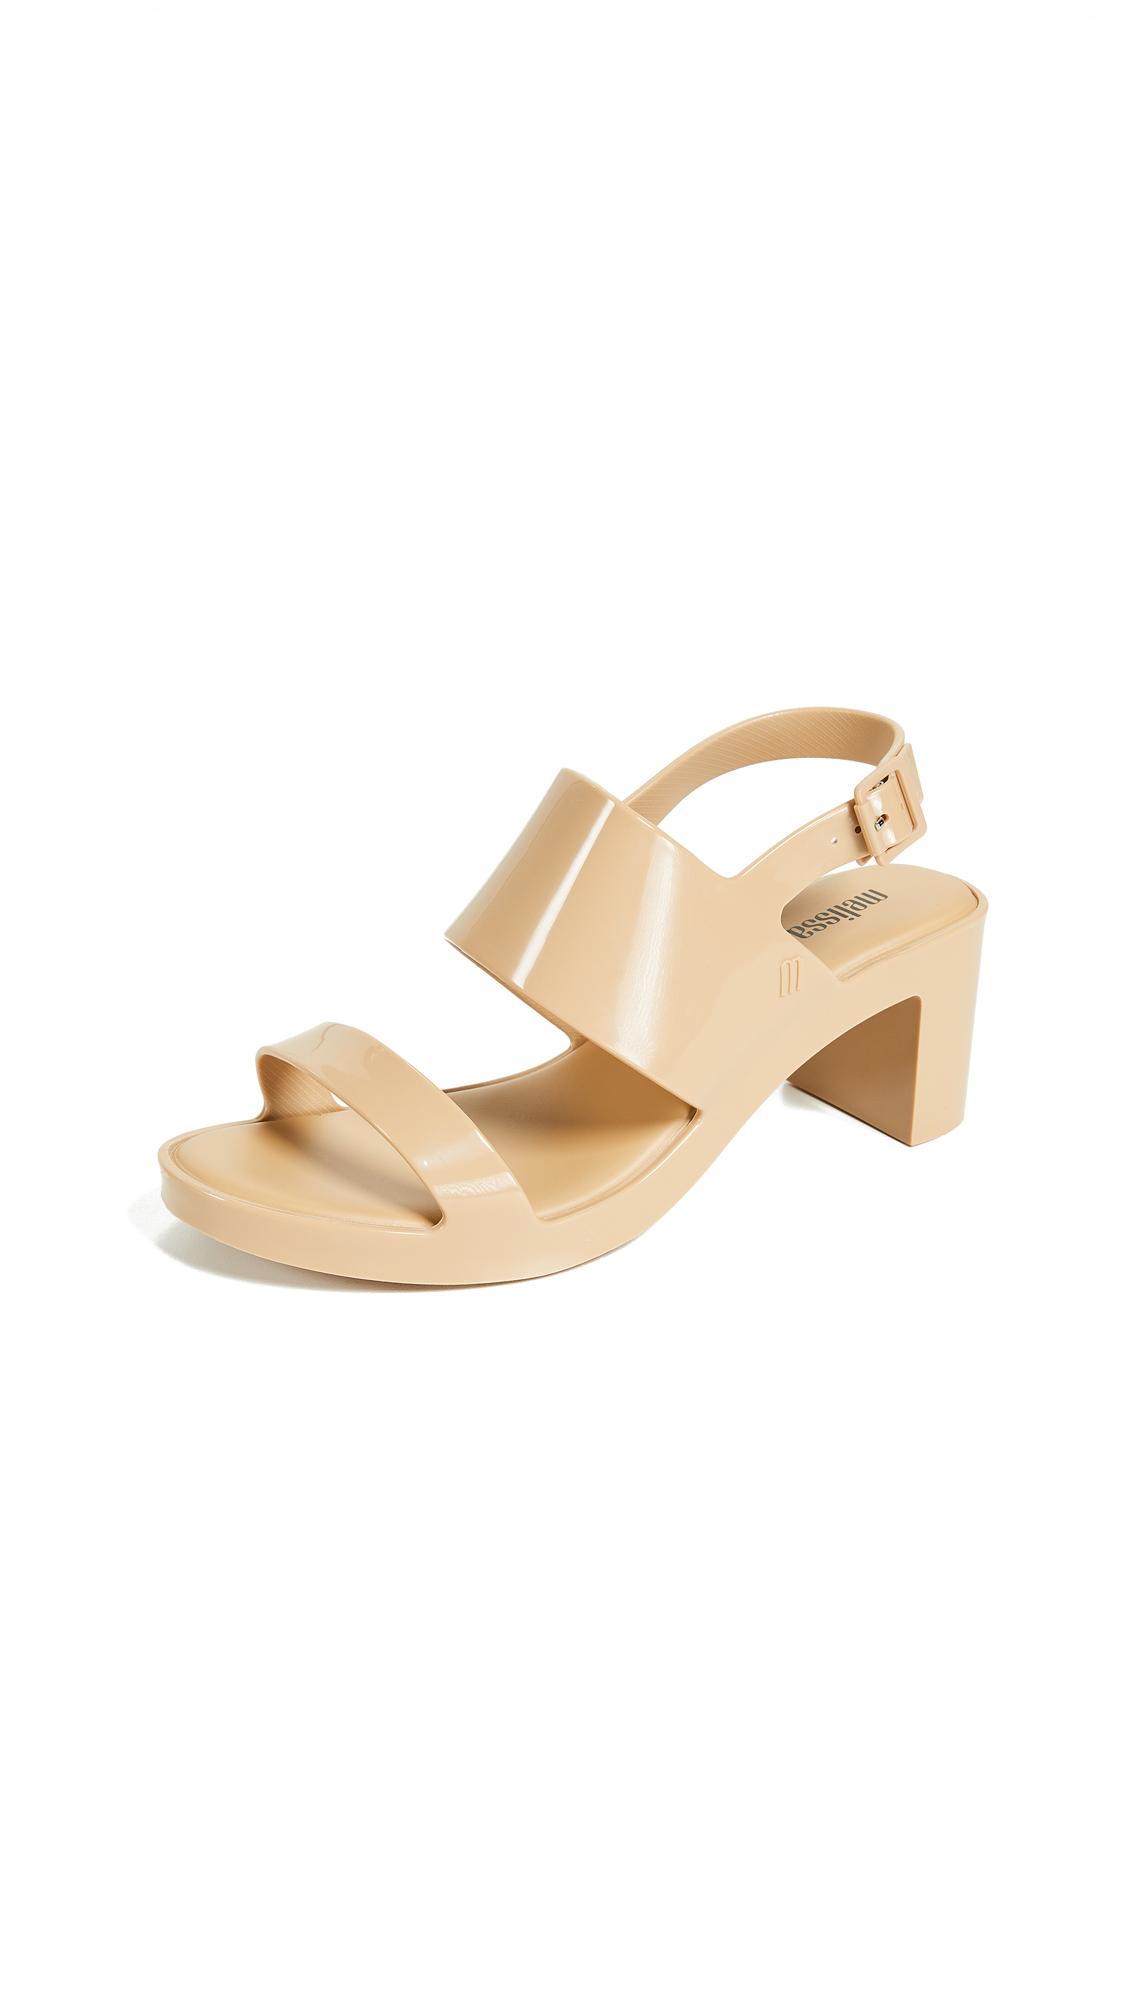 Melissa Classy Sandals - Beige